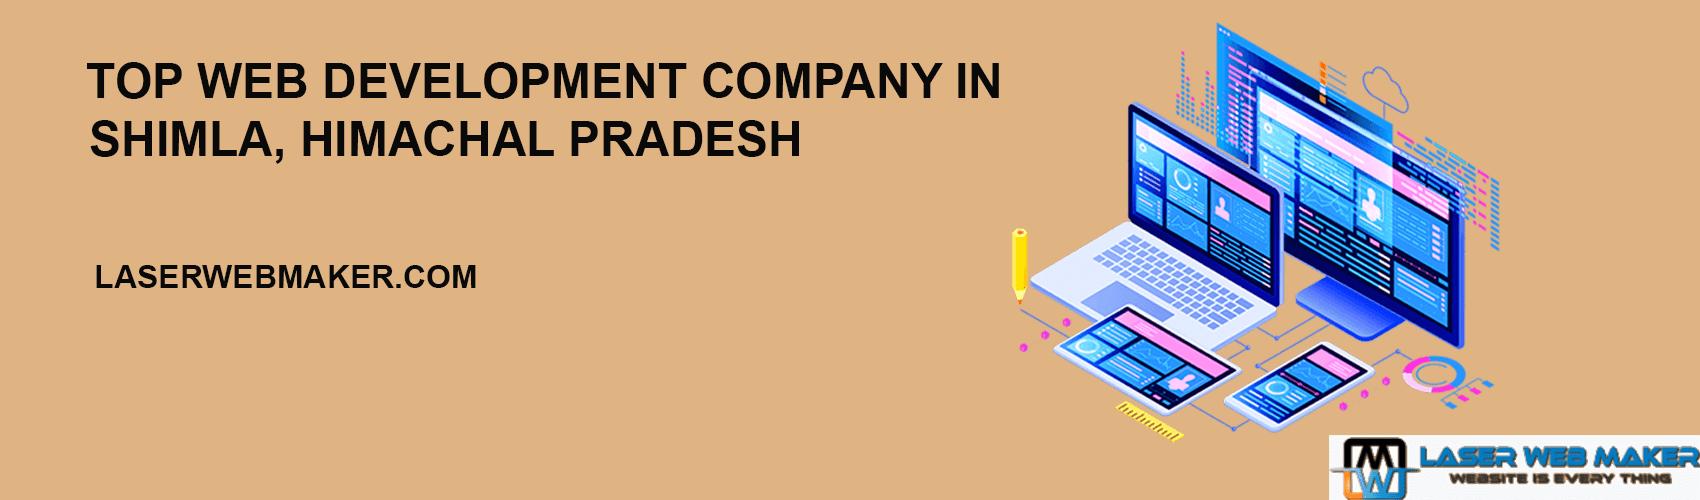 Top web development company in Shimla, Himachal Pradesh